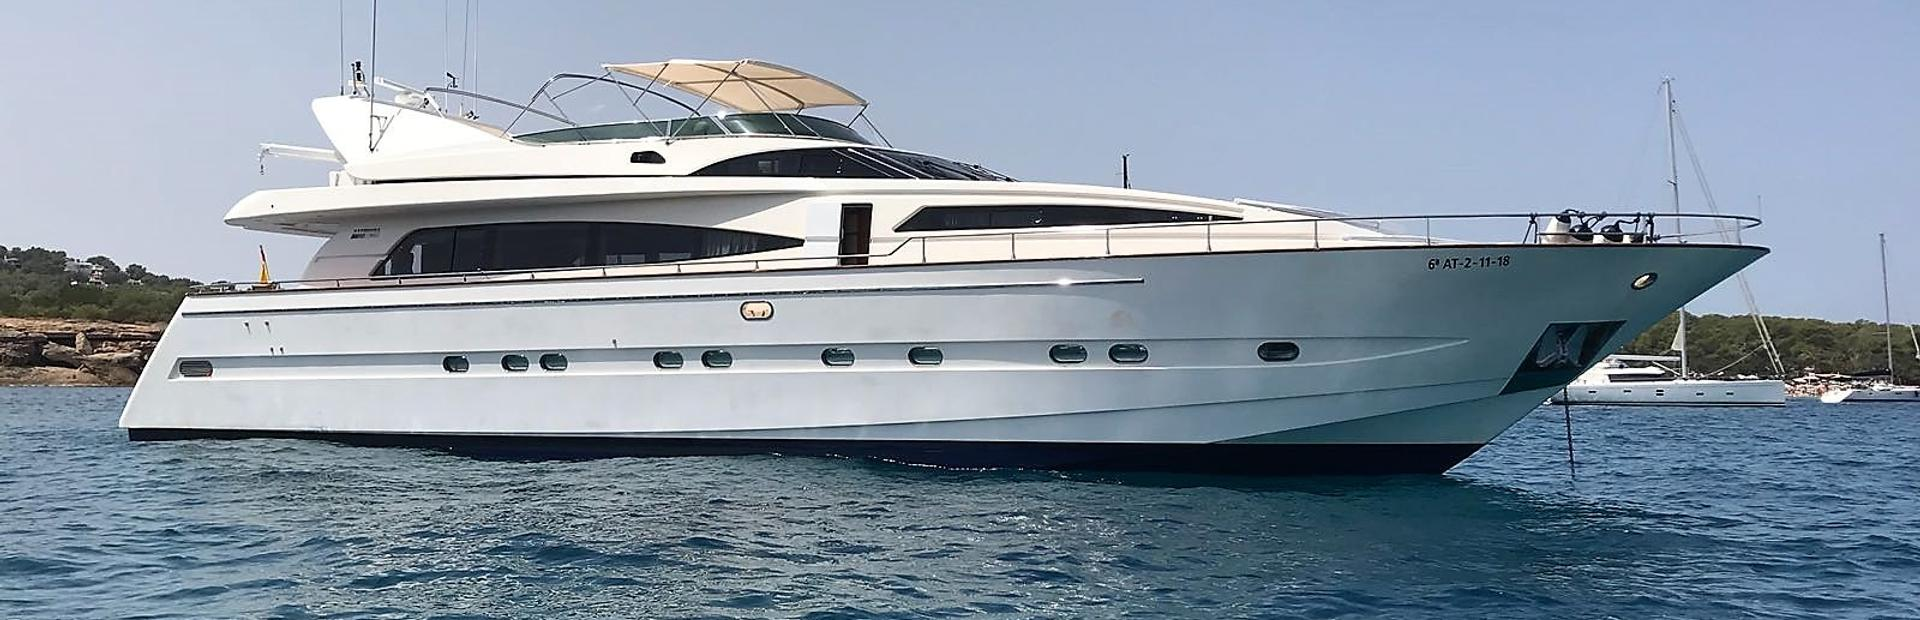 90 GLX Yacht Charter